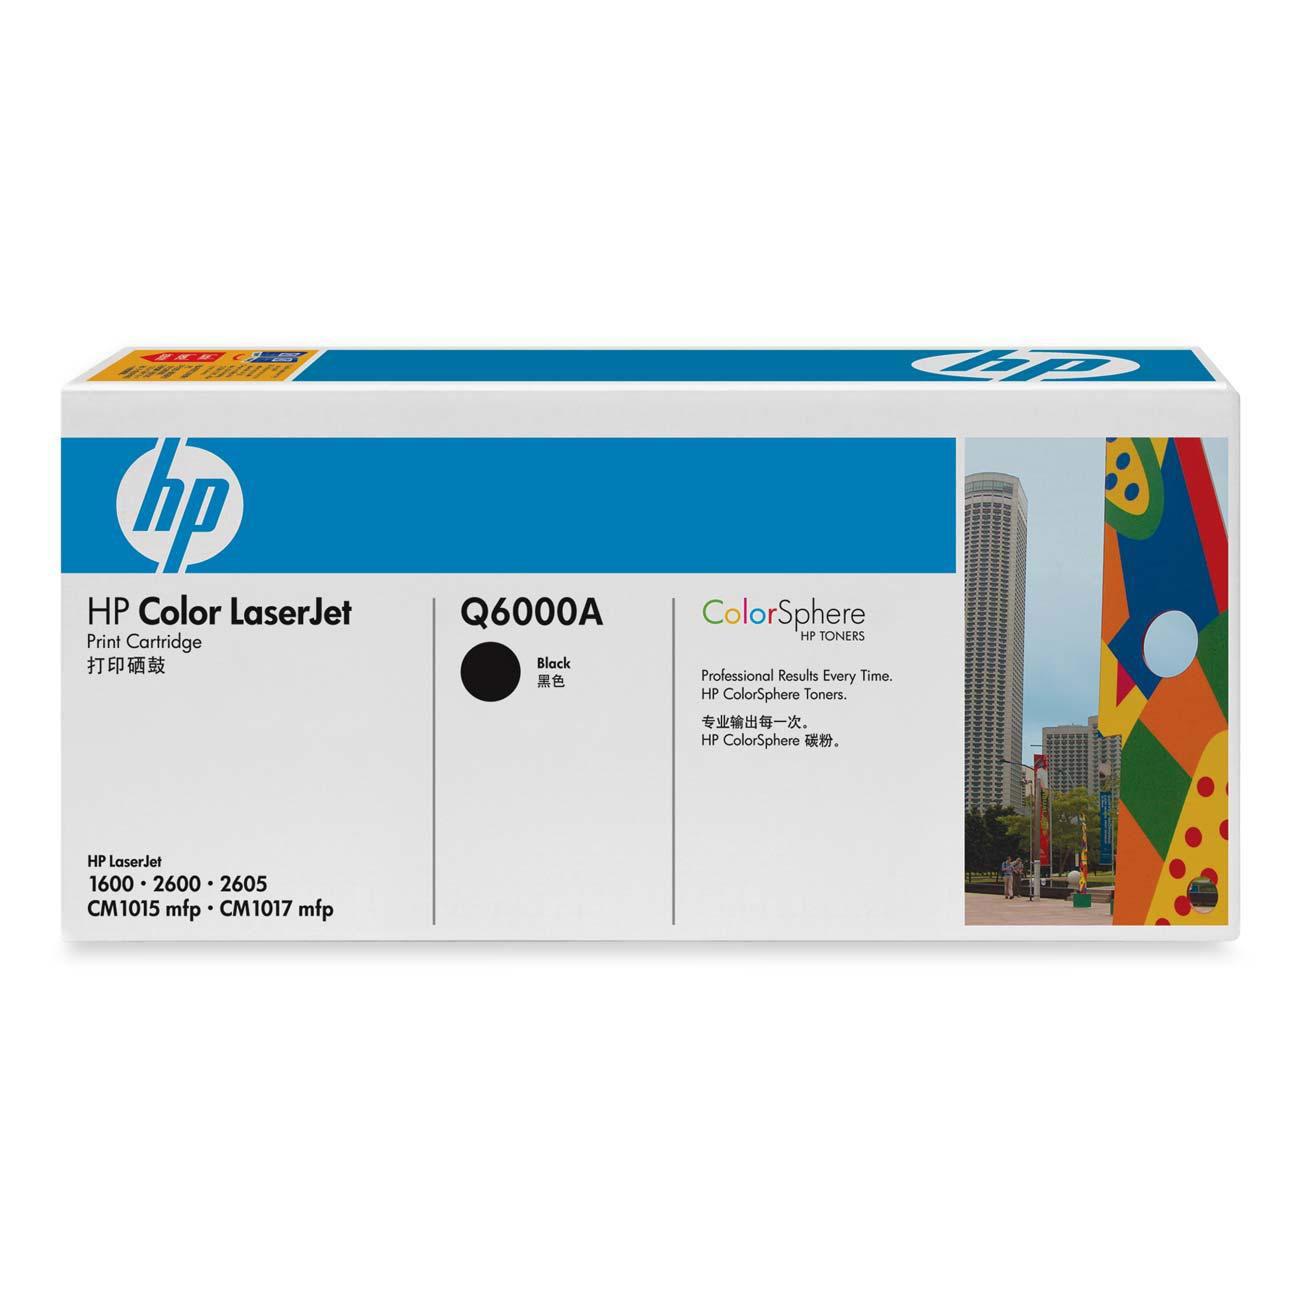 Printer Ink Cartridges And Toner Inkjet Hp Color Laserjet Cp4005 Cyan Cartridge Cb401a 124a Original Black Q6000a